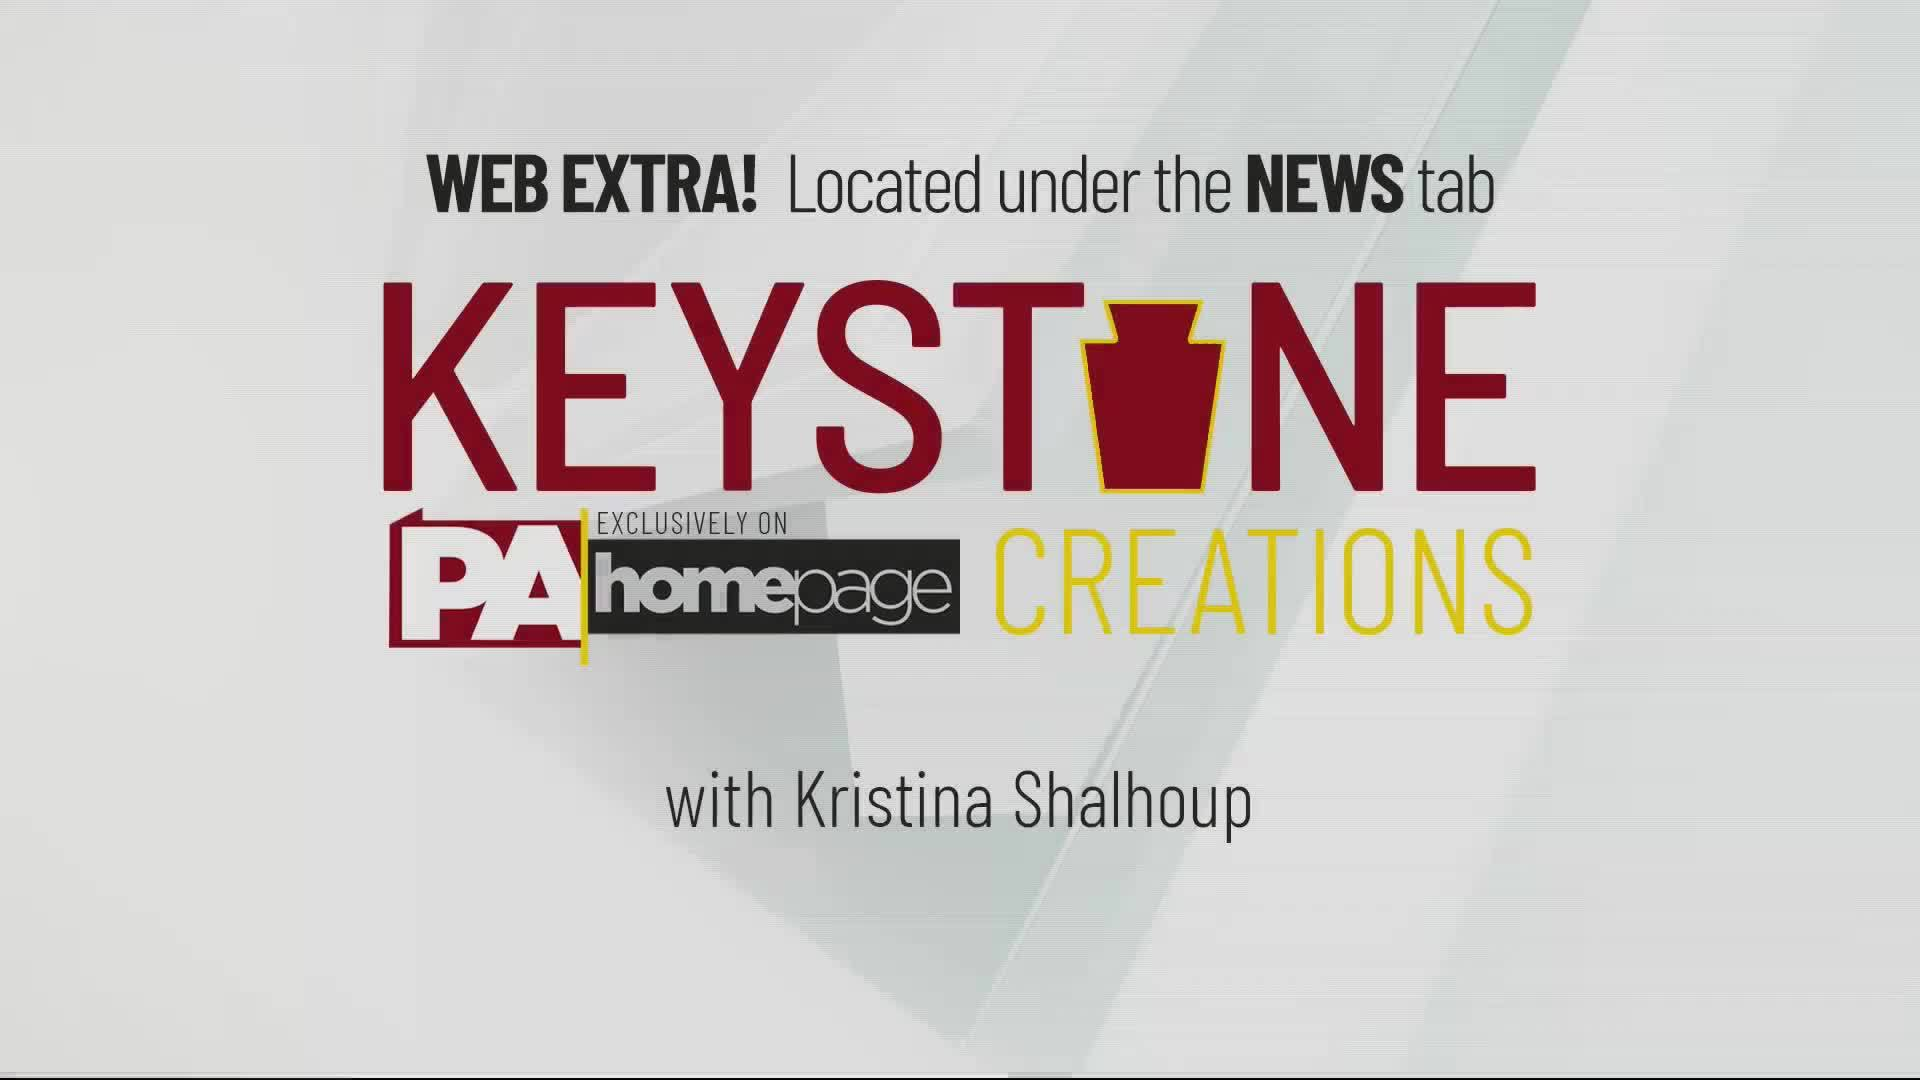 Keystone_Creations__Susquehanna_Brewing__1_20190325133641